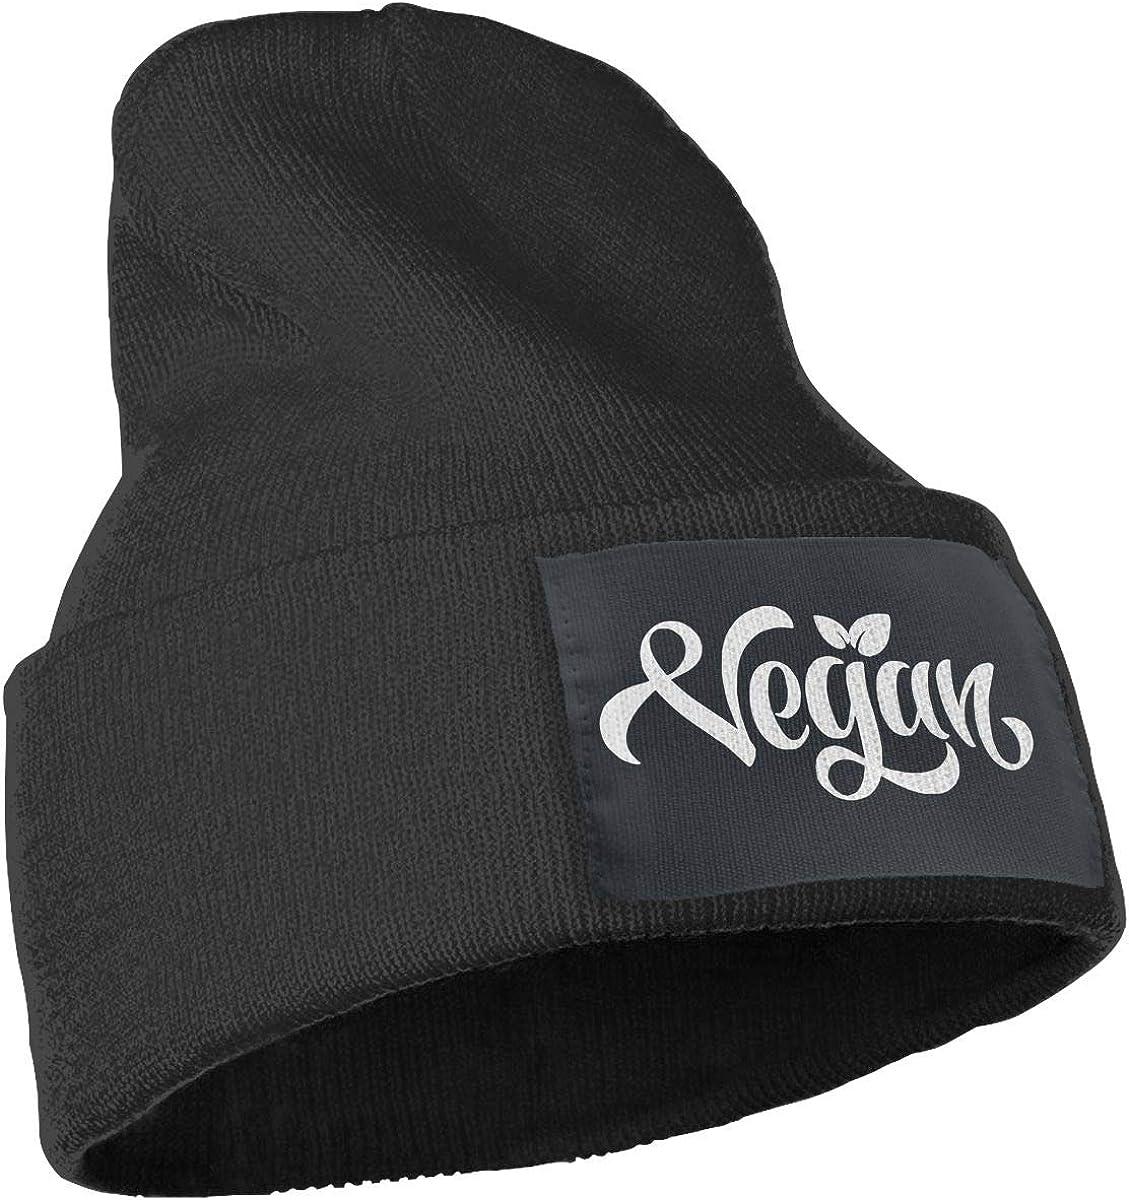 COLLJL-8 Unisex Vegan Outdoor Stretch Knit Beanies Hat Soft Winter Skull Caps